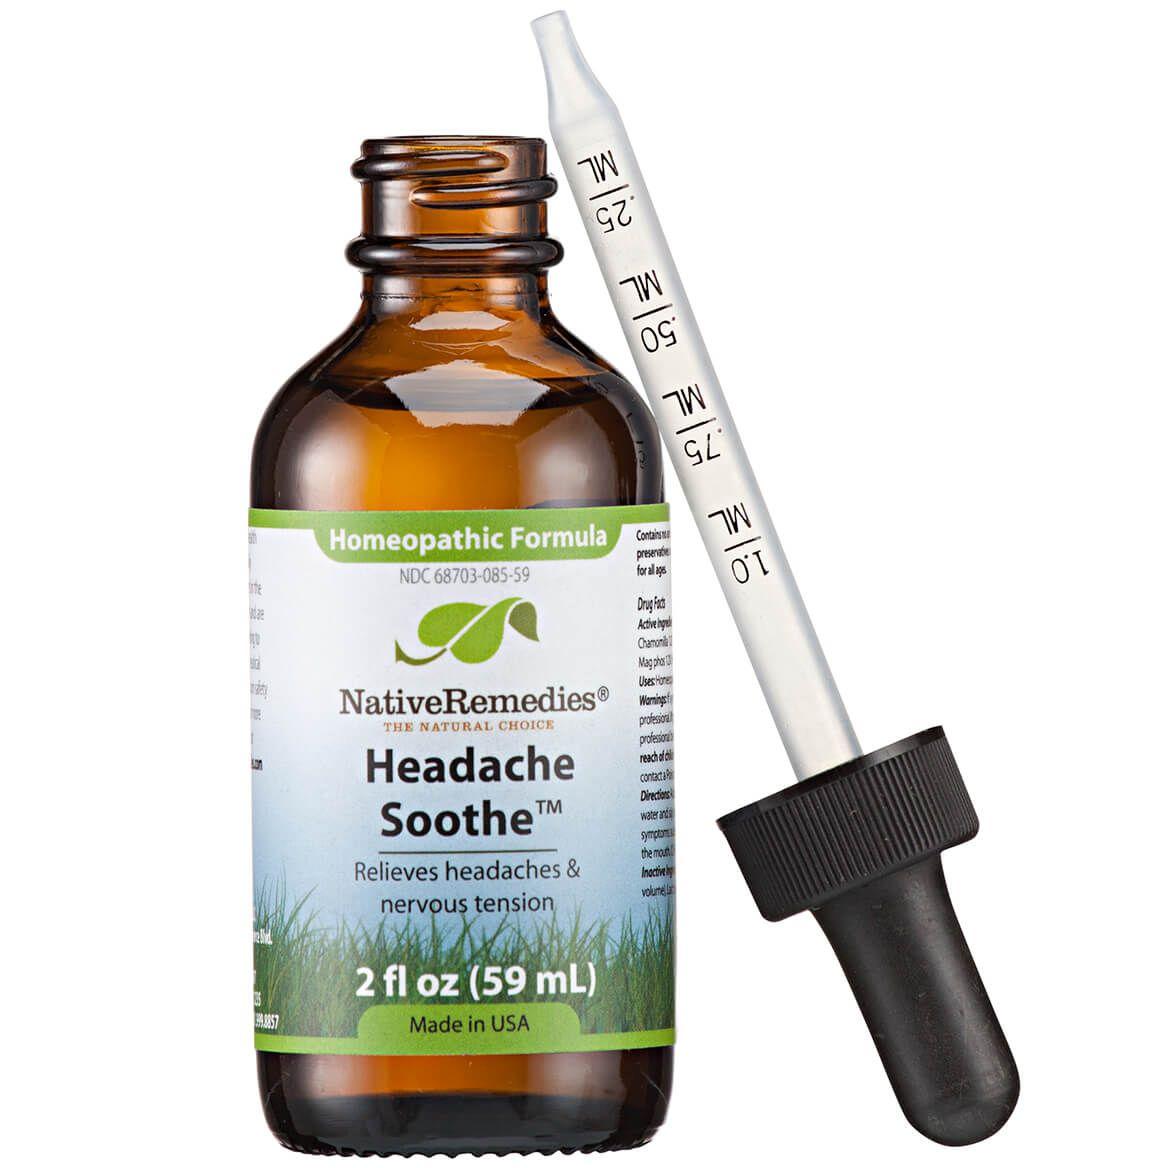 NativeRemedies® Headache Soothe™-350107